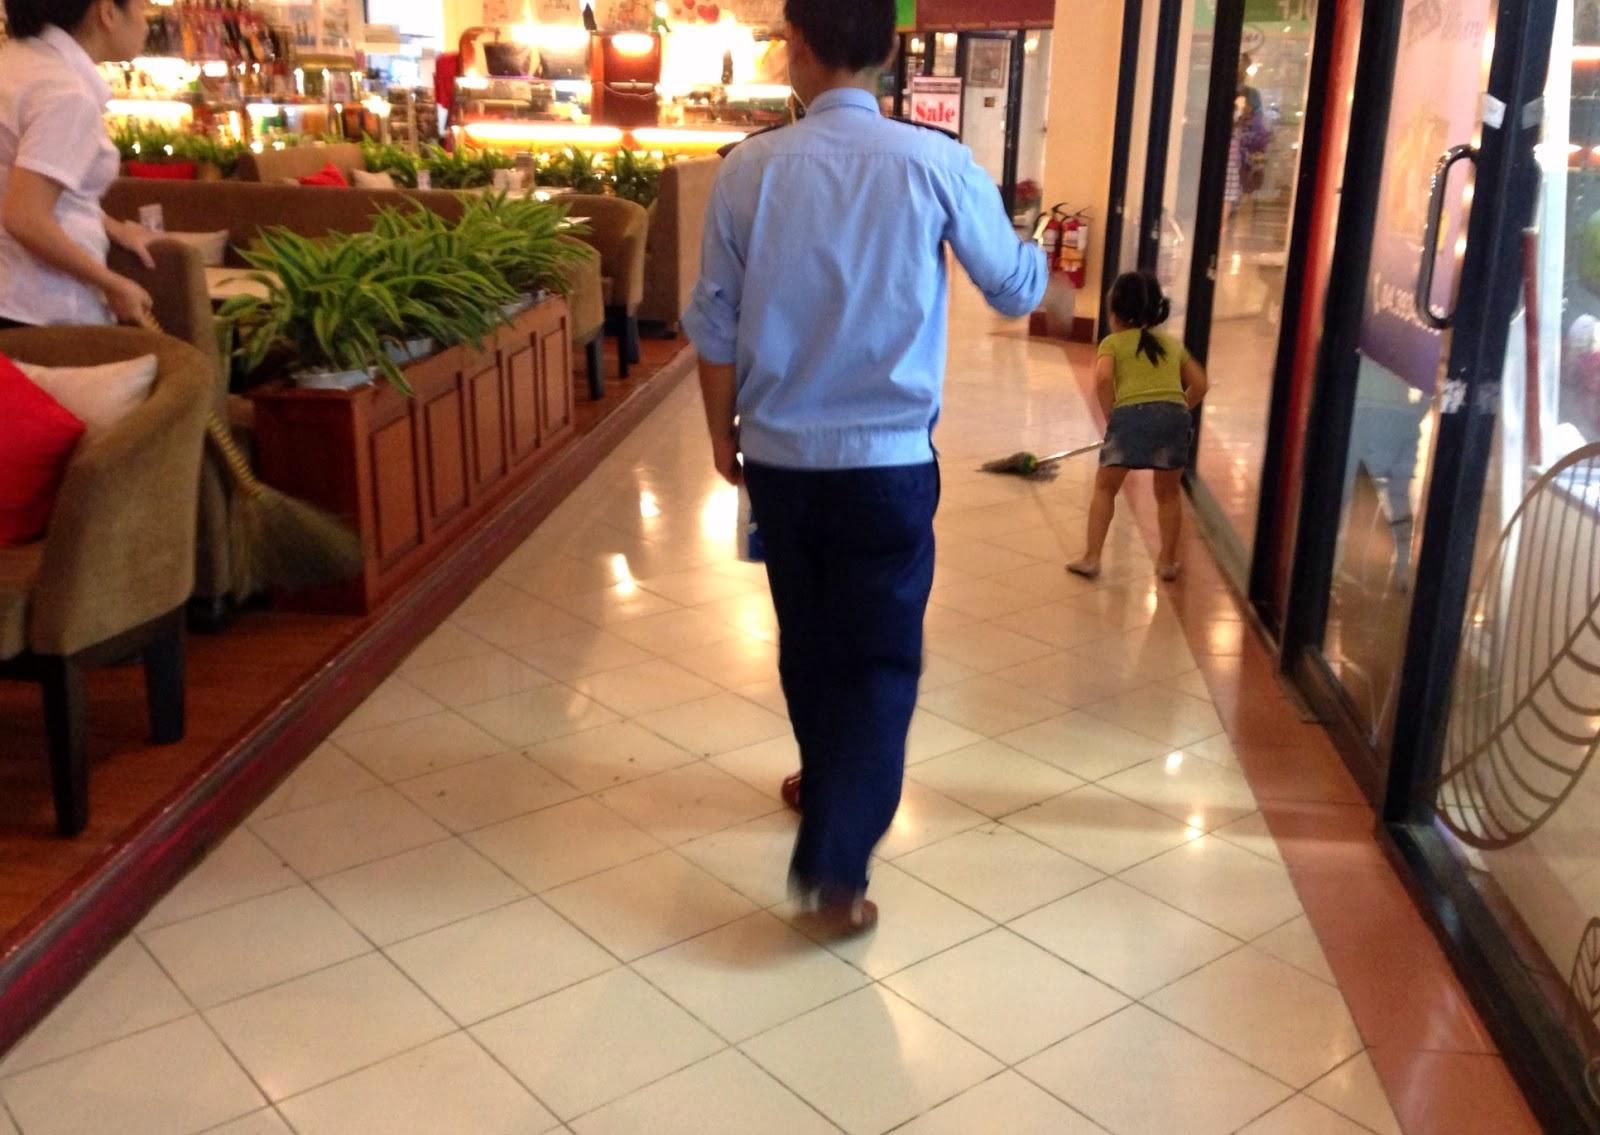 sweep-the-floor-vietnam ベトナムの掃き掃除文化